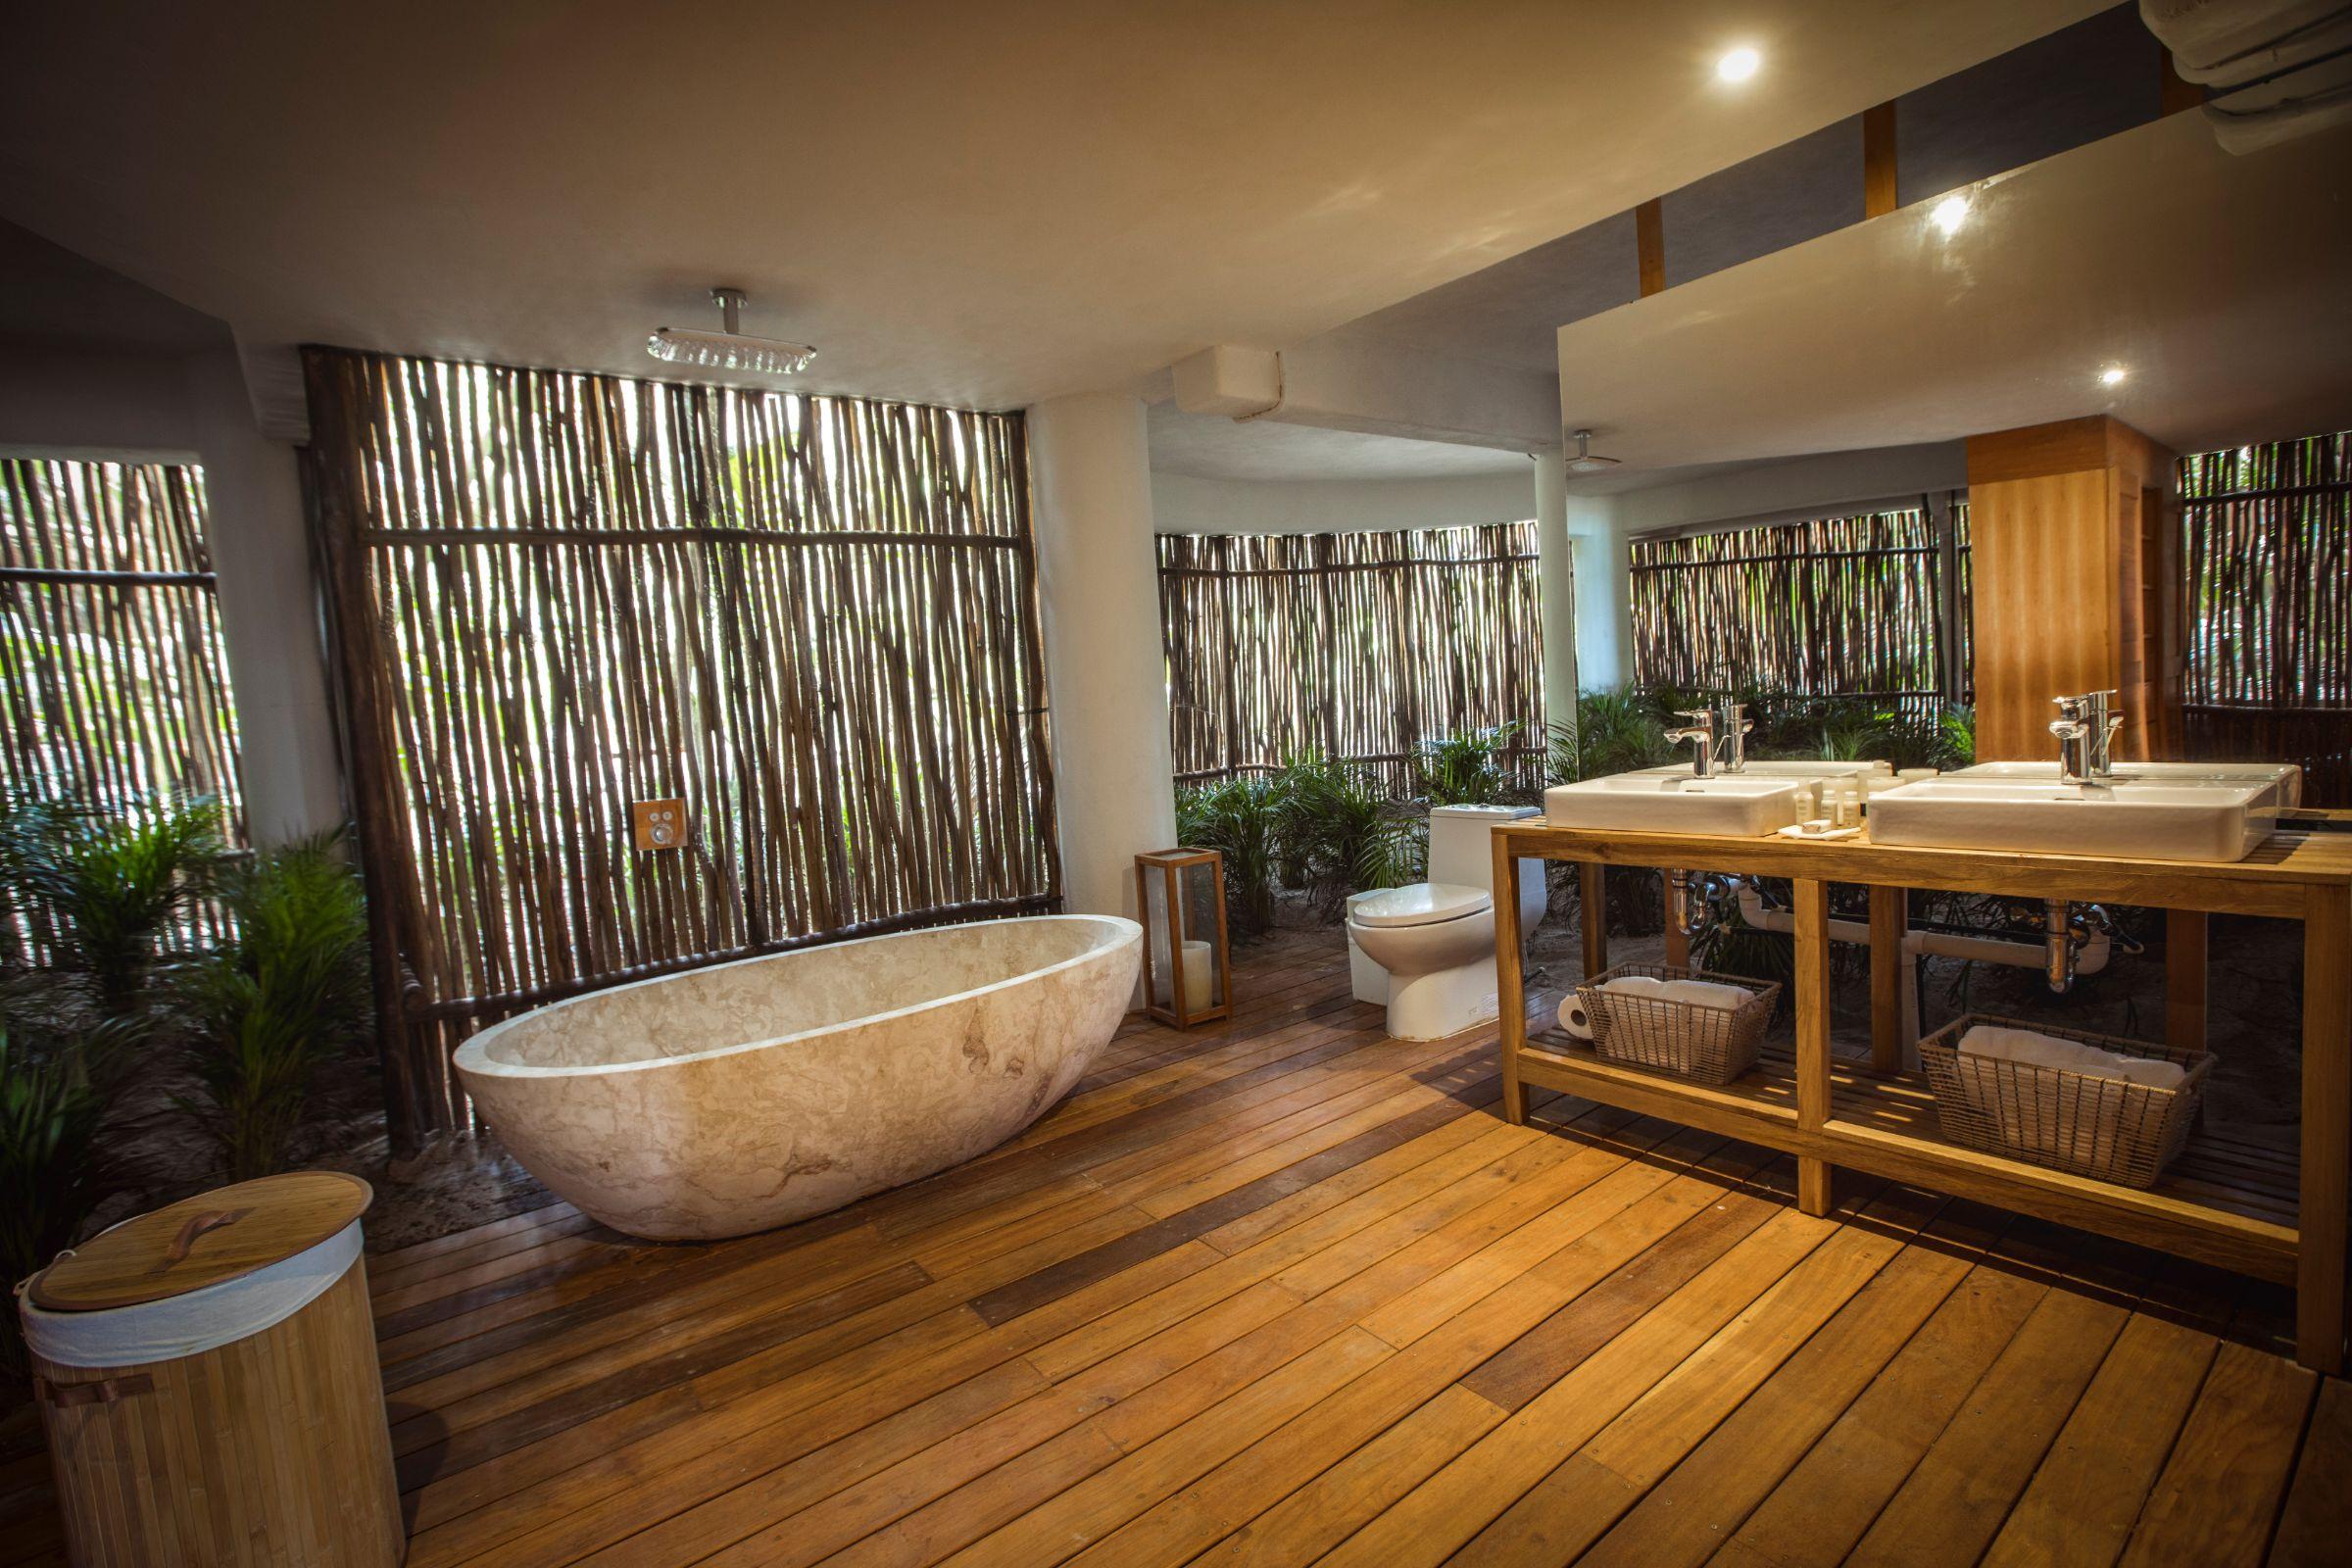 tulum seacesta bathroom